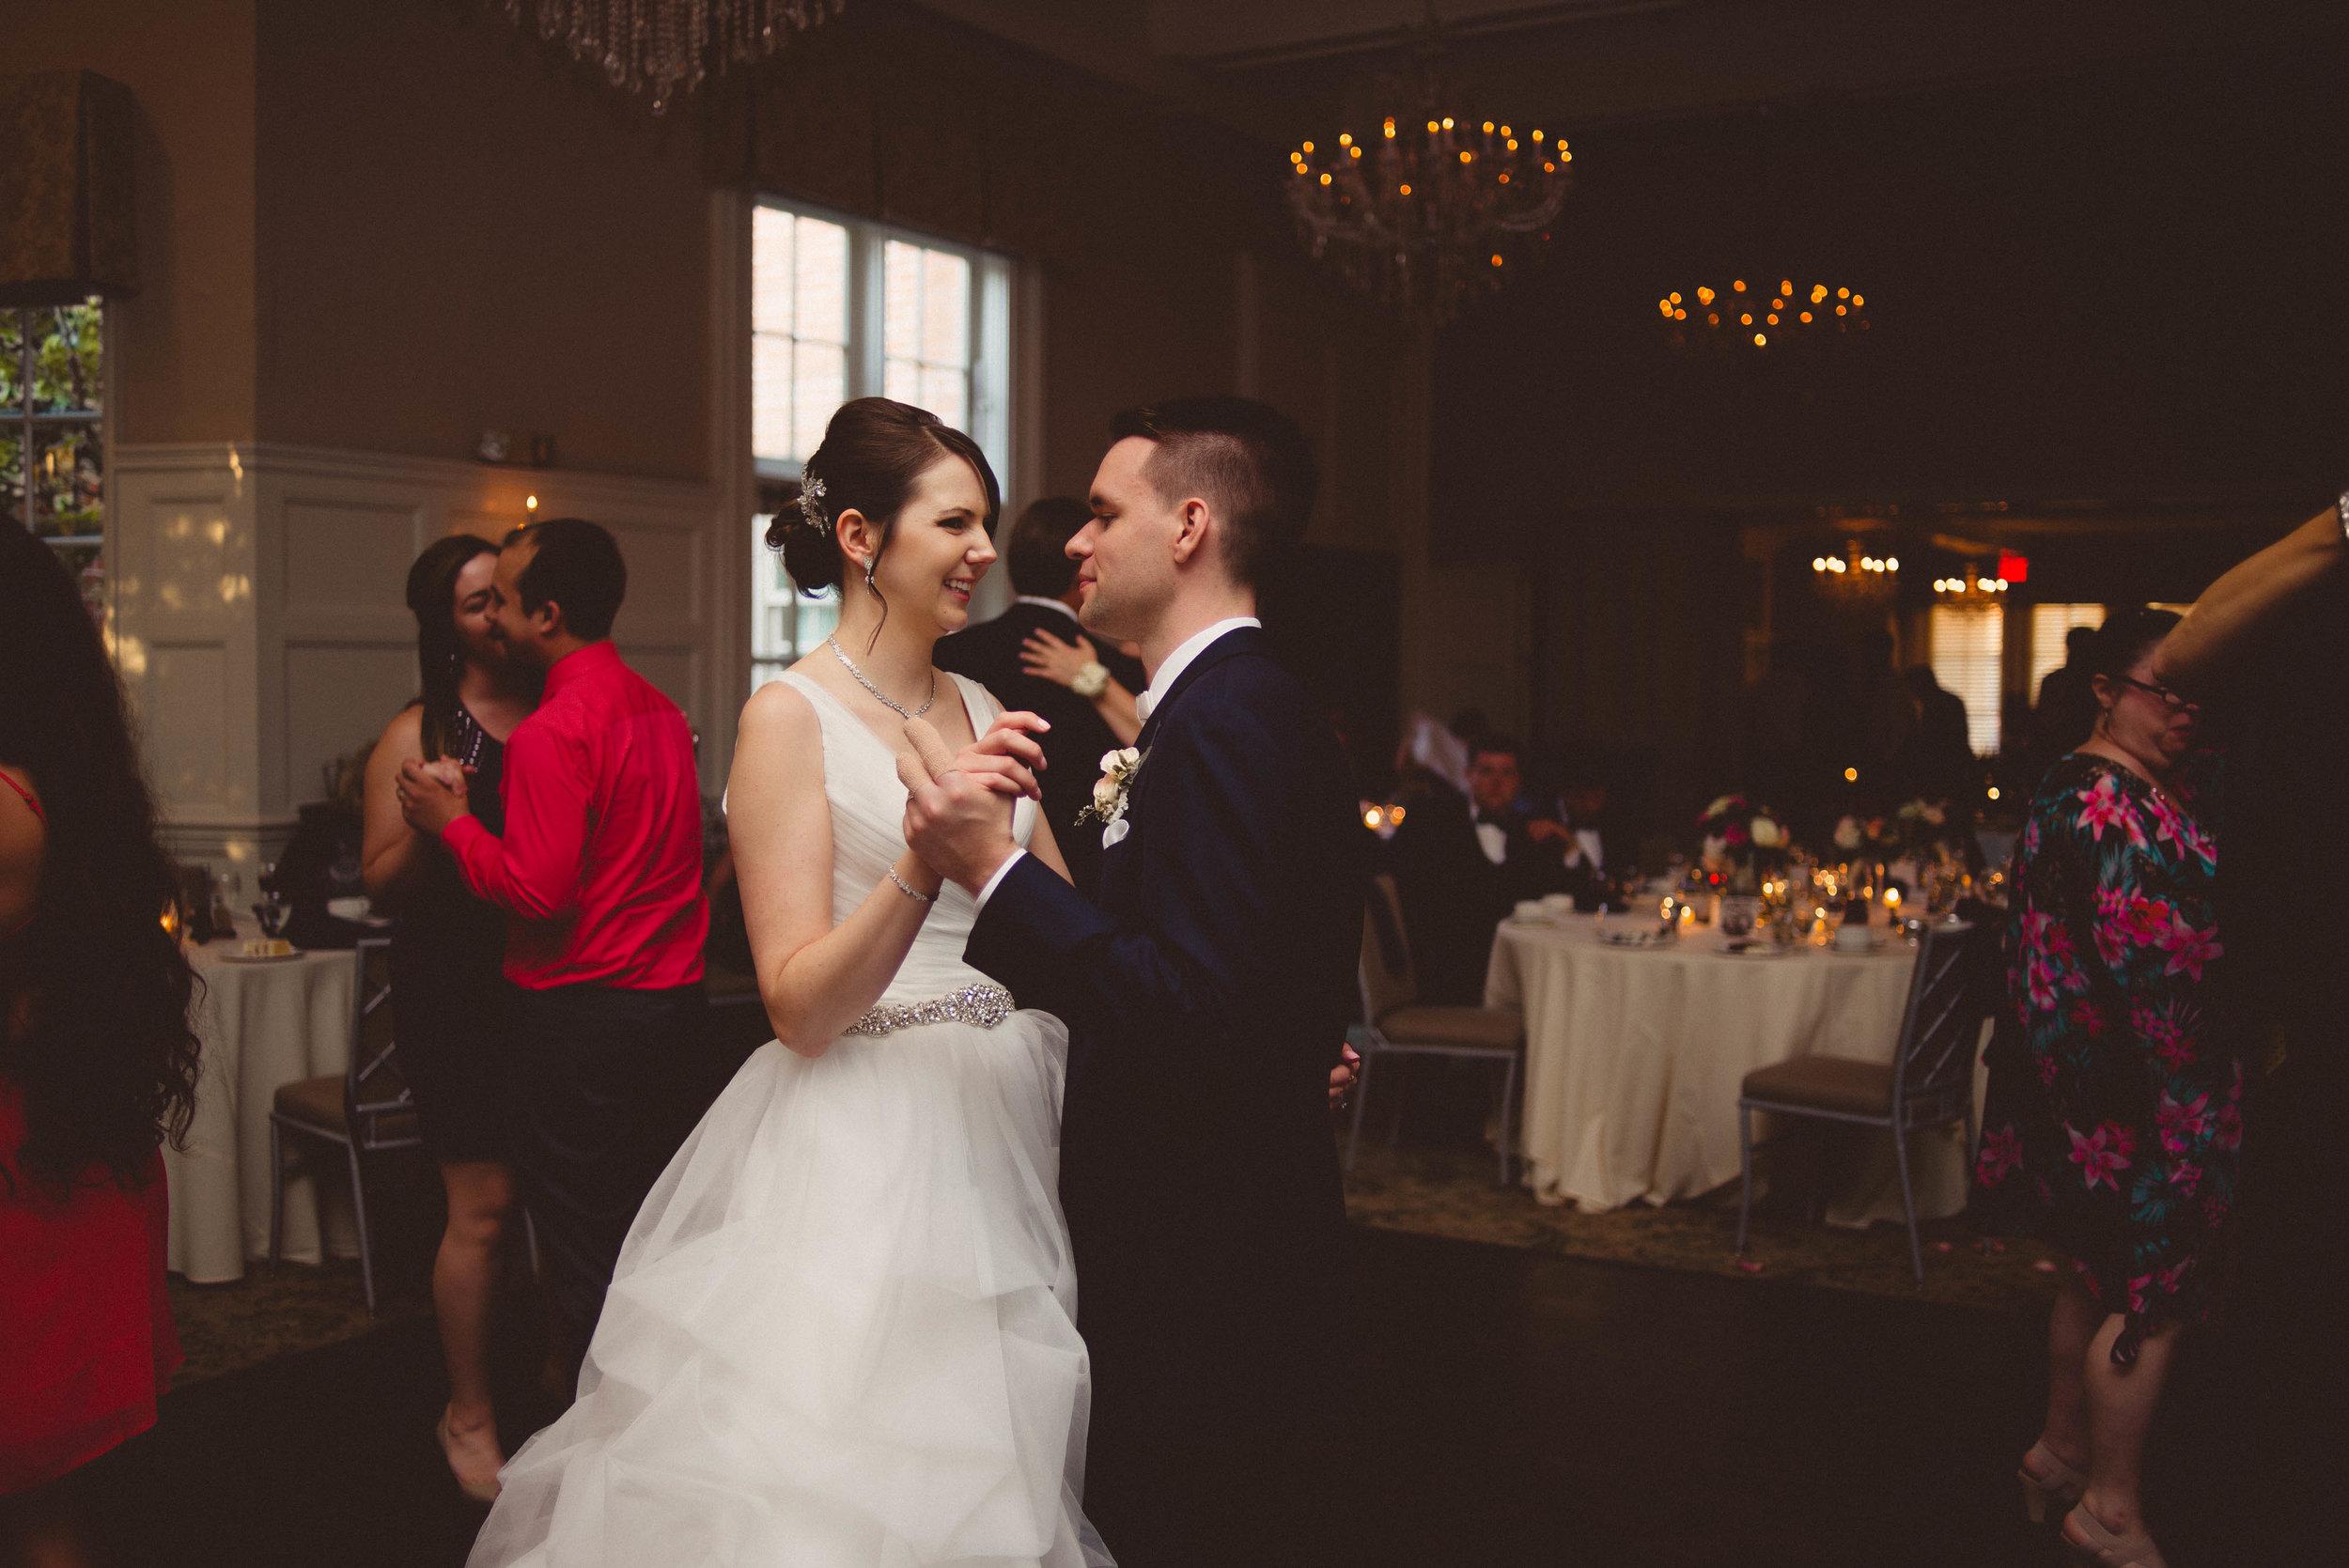 Kara and Mike Wedding-20160904-19-30-21.jpg